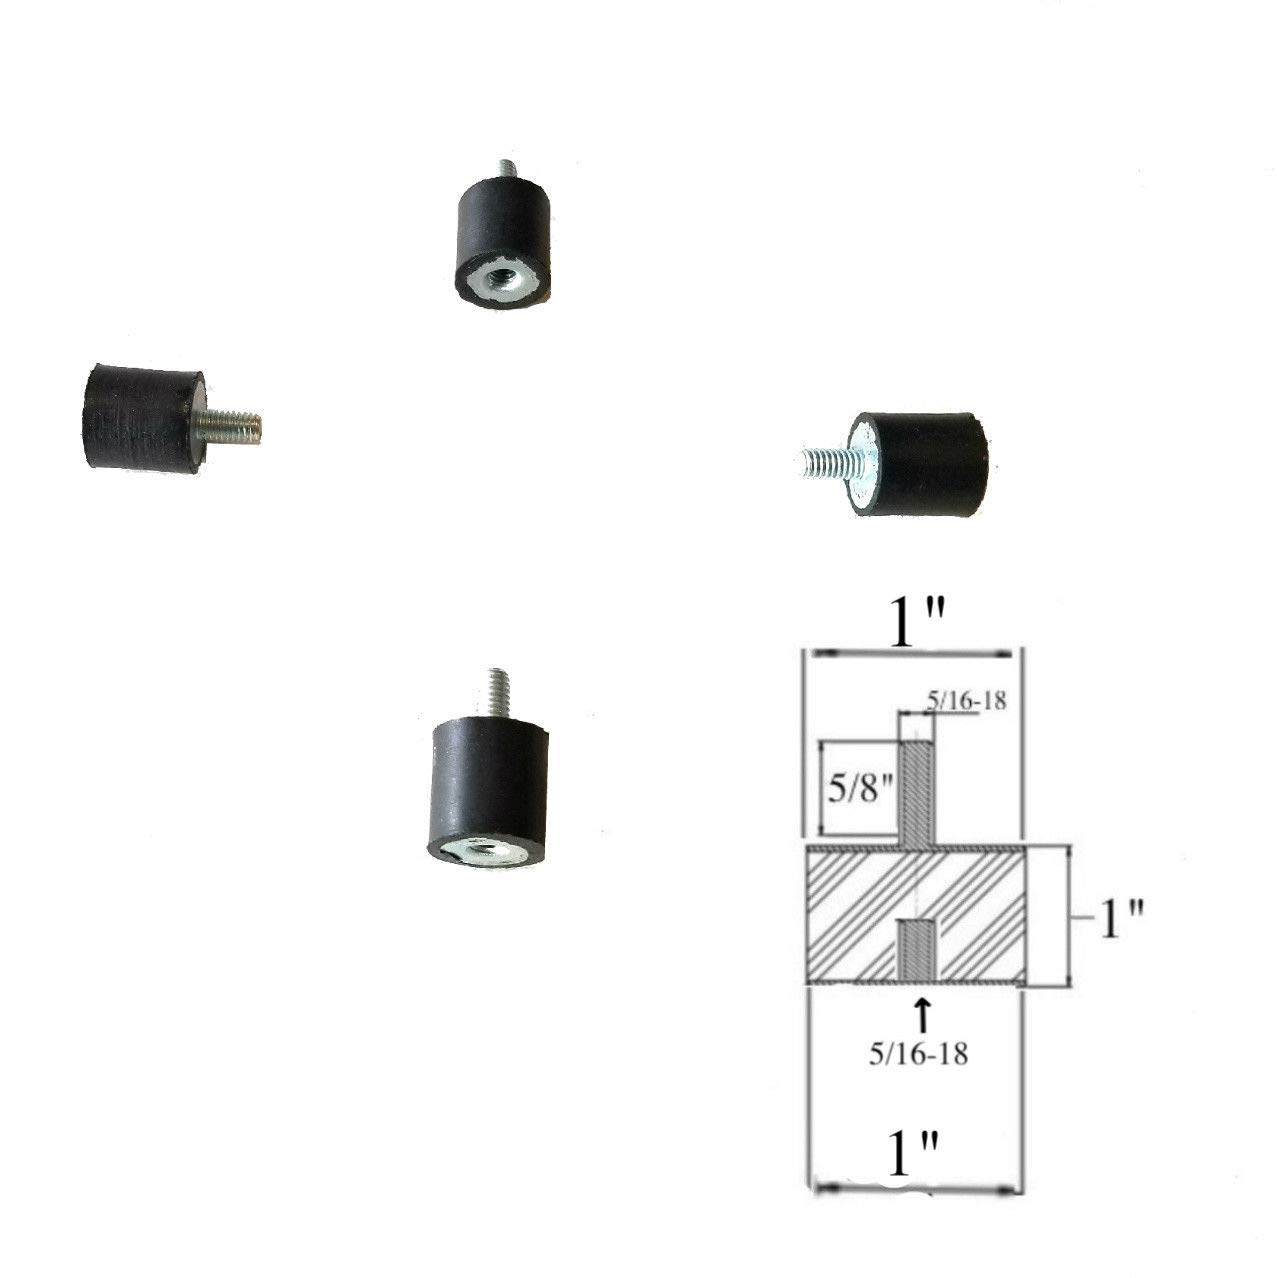 5//16-18 x 3//4 Long Studs 1-1//4 Rubber Diameter x 3//4 Rubber Height 4 Rubber Vibration Isolator Mounts